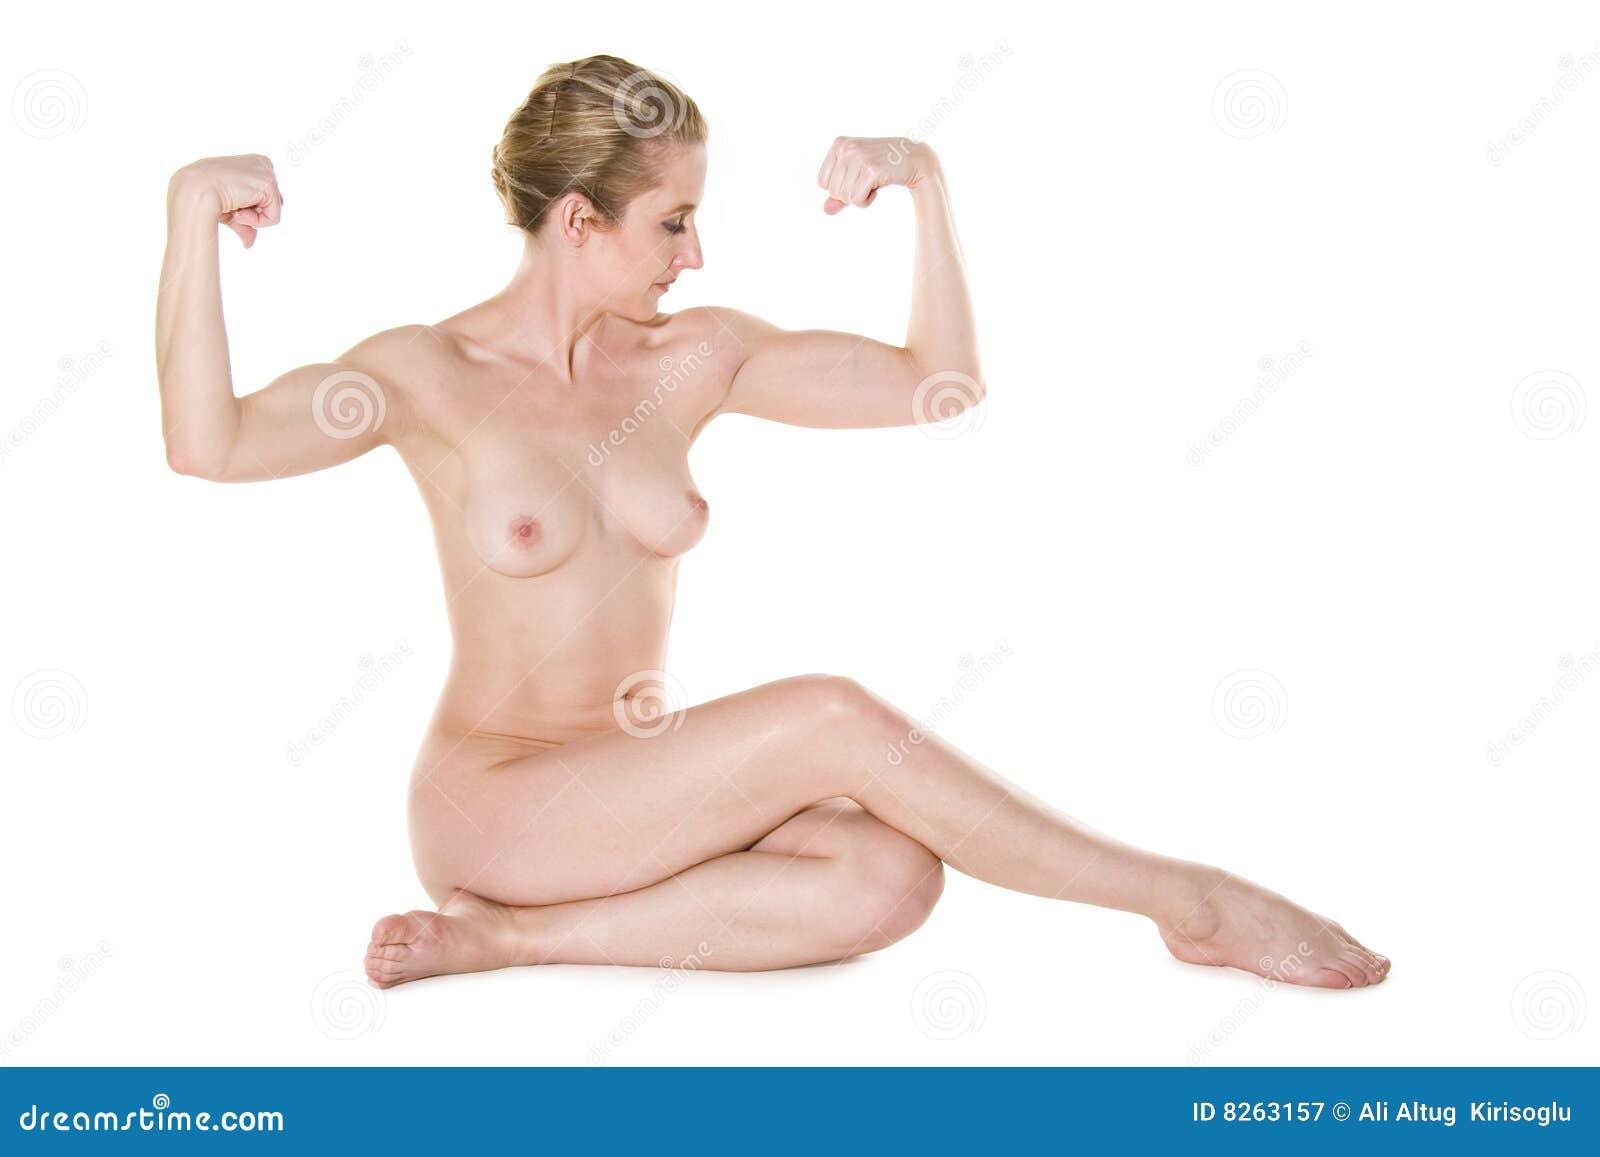 Healthy Women Nudes 86